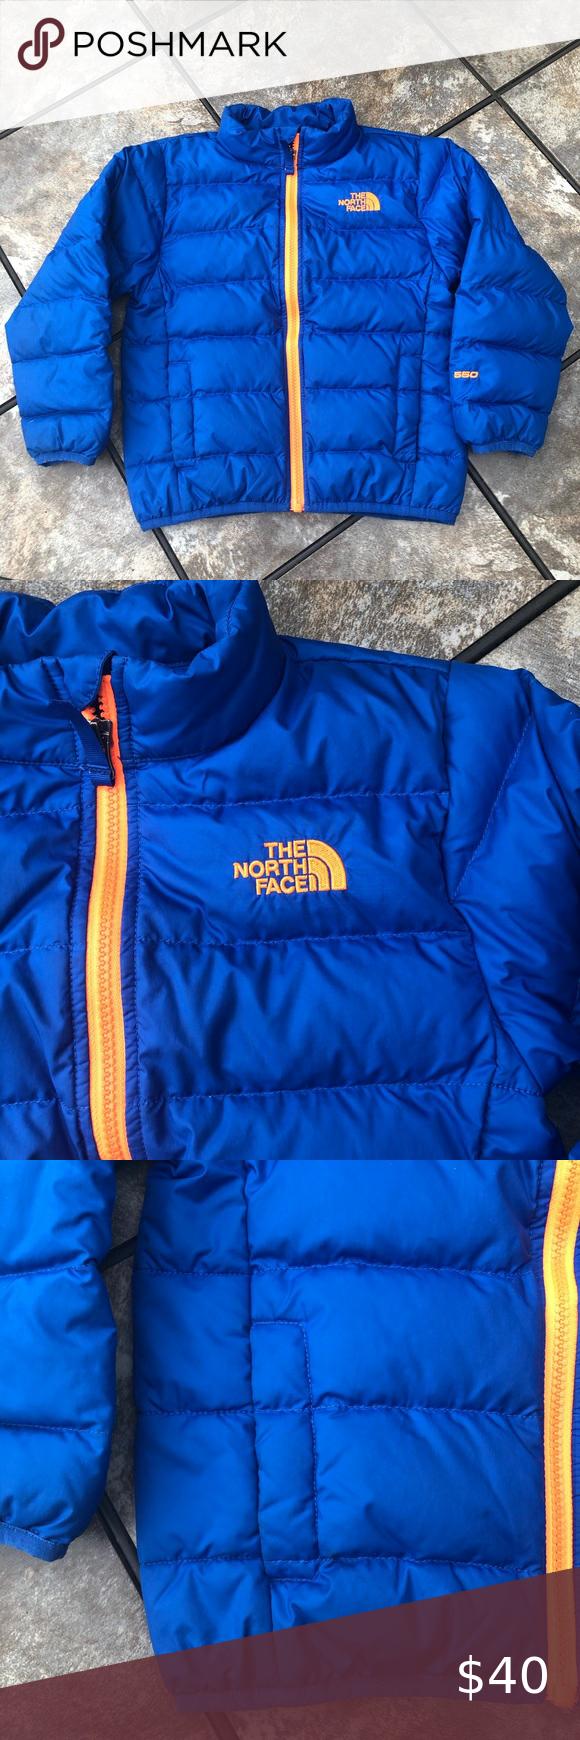 Boys North Face Blue Puffer Coat Blue Puffer Girls North Face Jacket Blue North Face Jacket [ 1740 x 580 Pixel ]